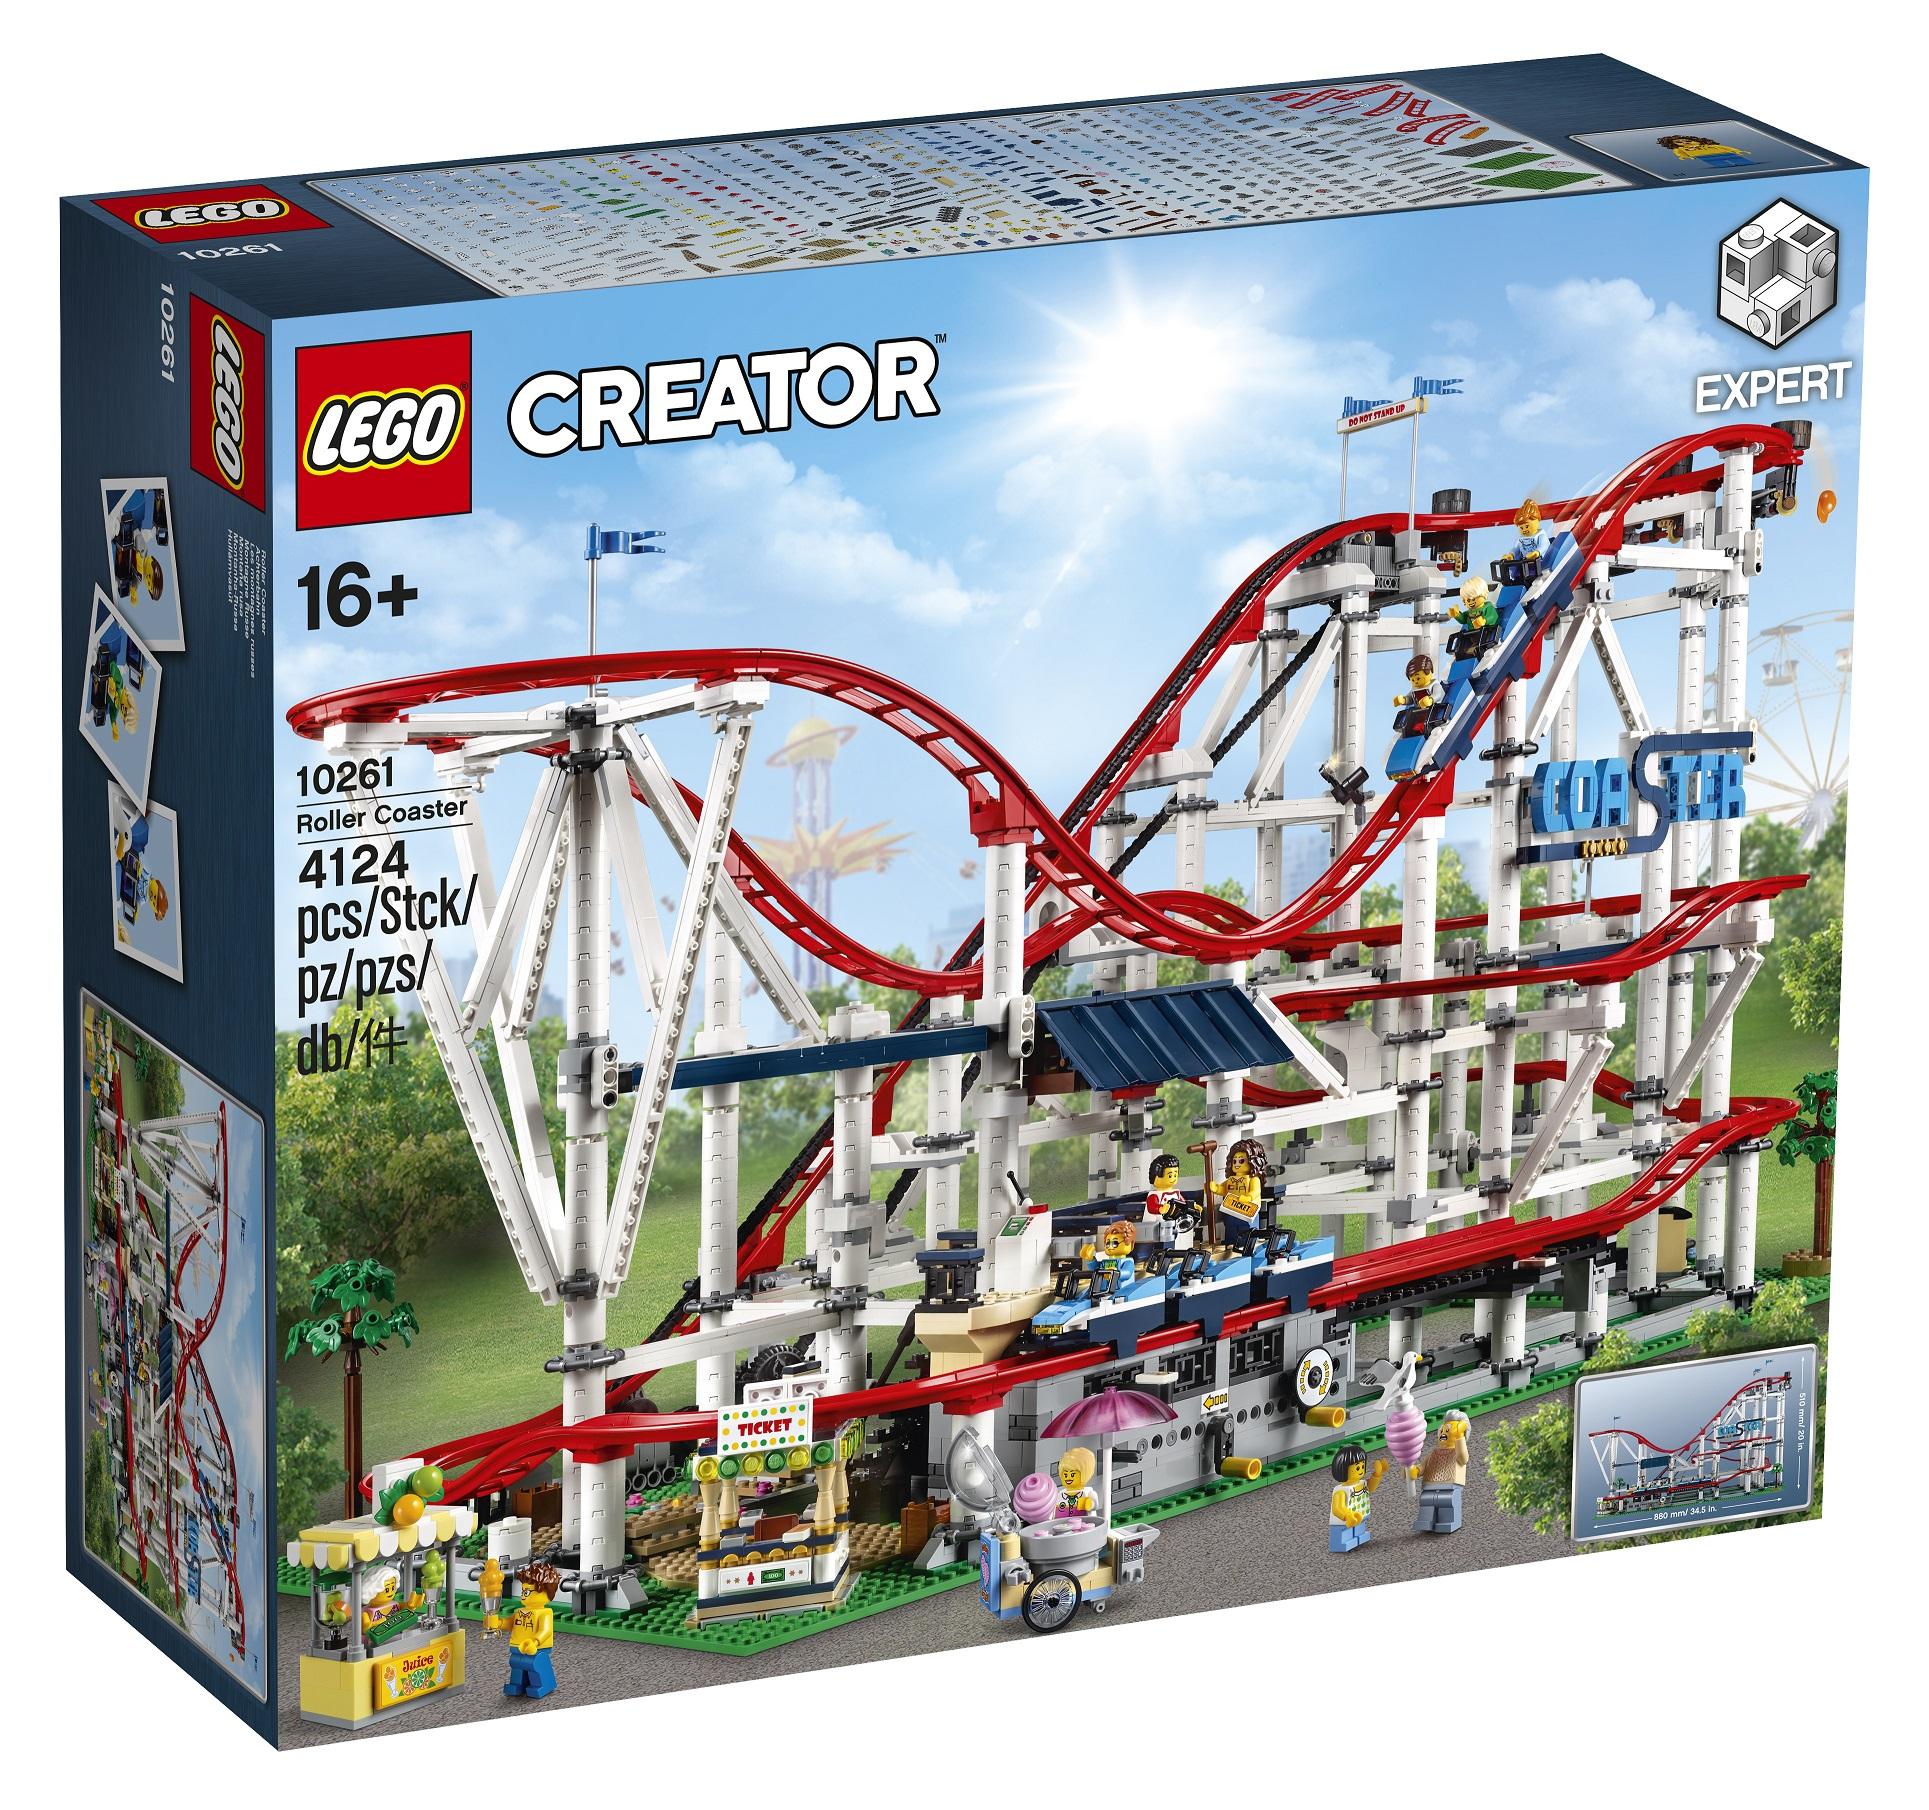 lego announces 10261 creator expert roller coaster. Black Bedroom Furniture Sets. Home Design Ideas